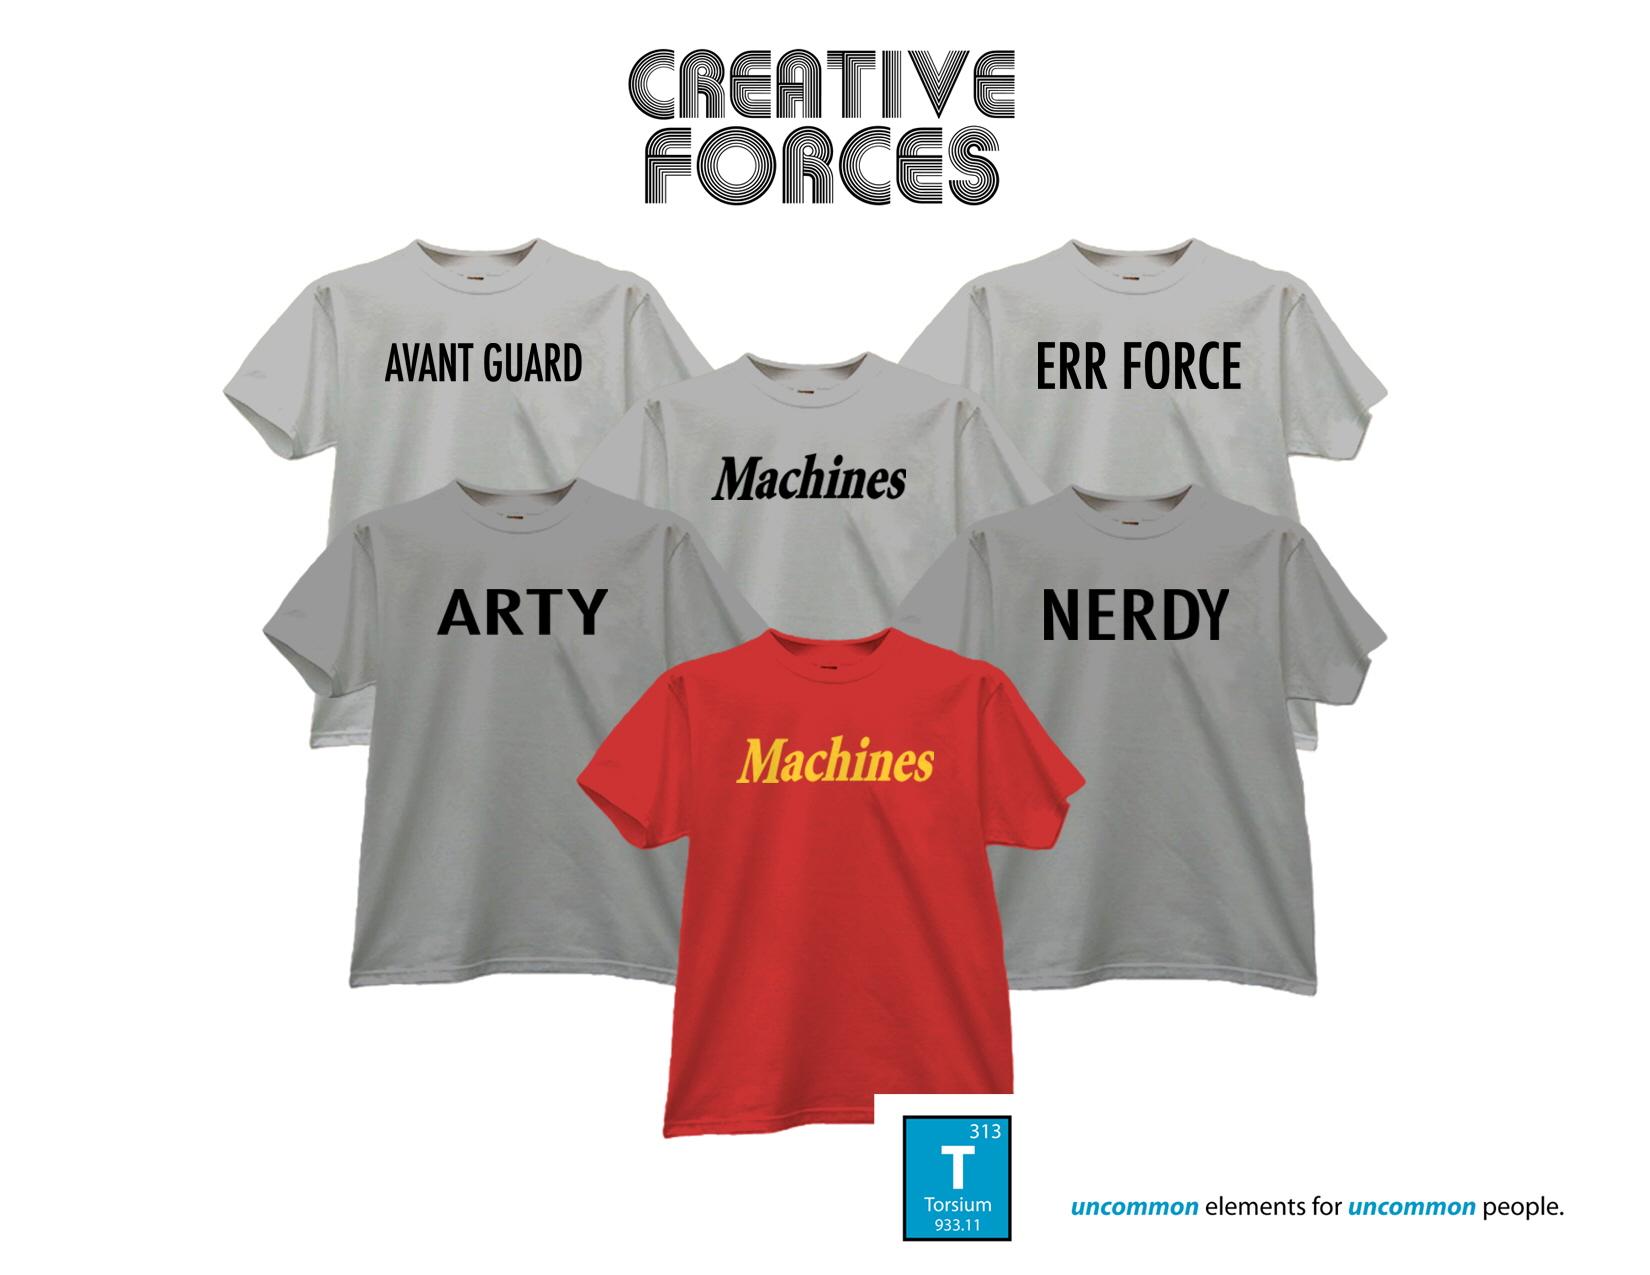 Shirt design layout - T Shirt Marketing Flyer Design Layout And Graphics Torsium Photoshop And Illustrator 2012